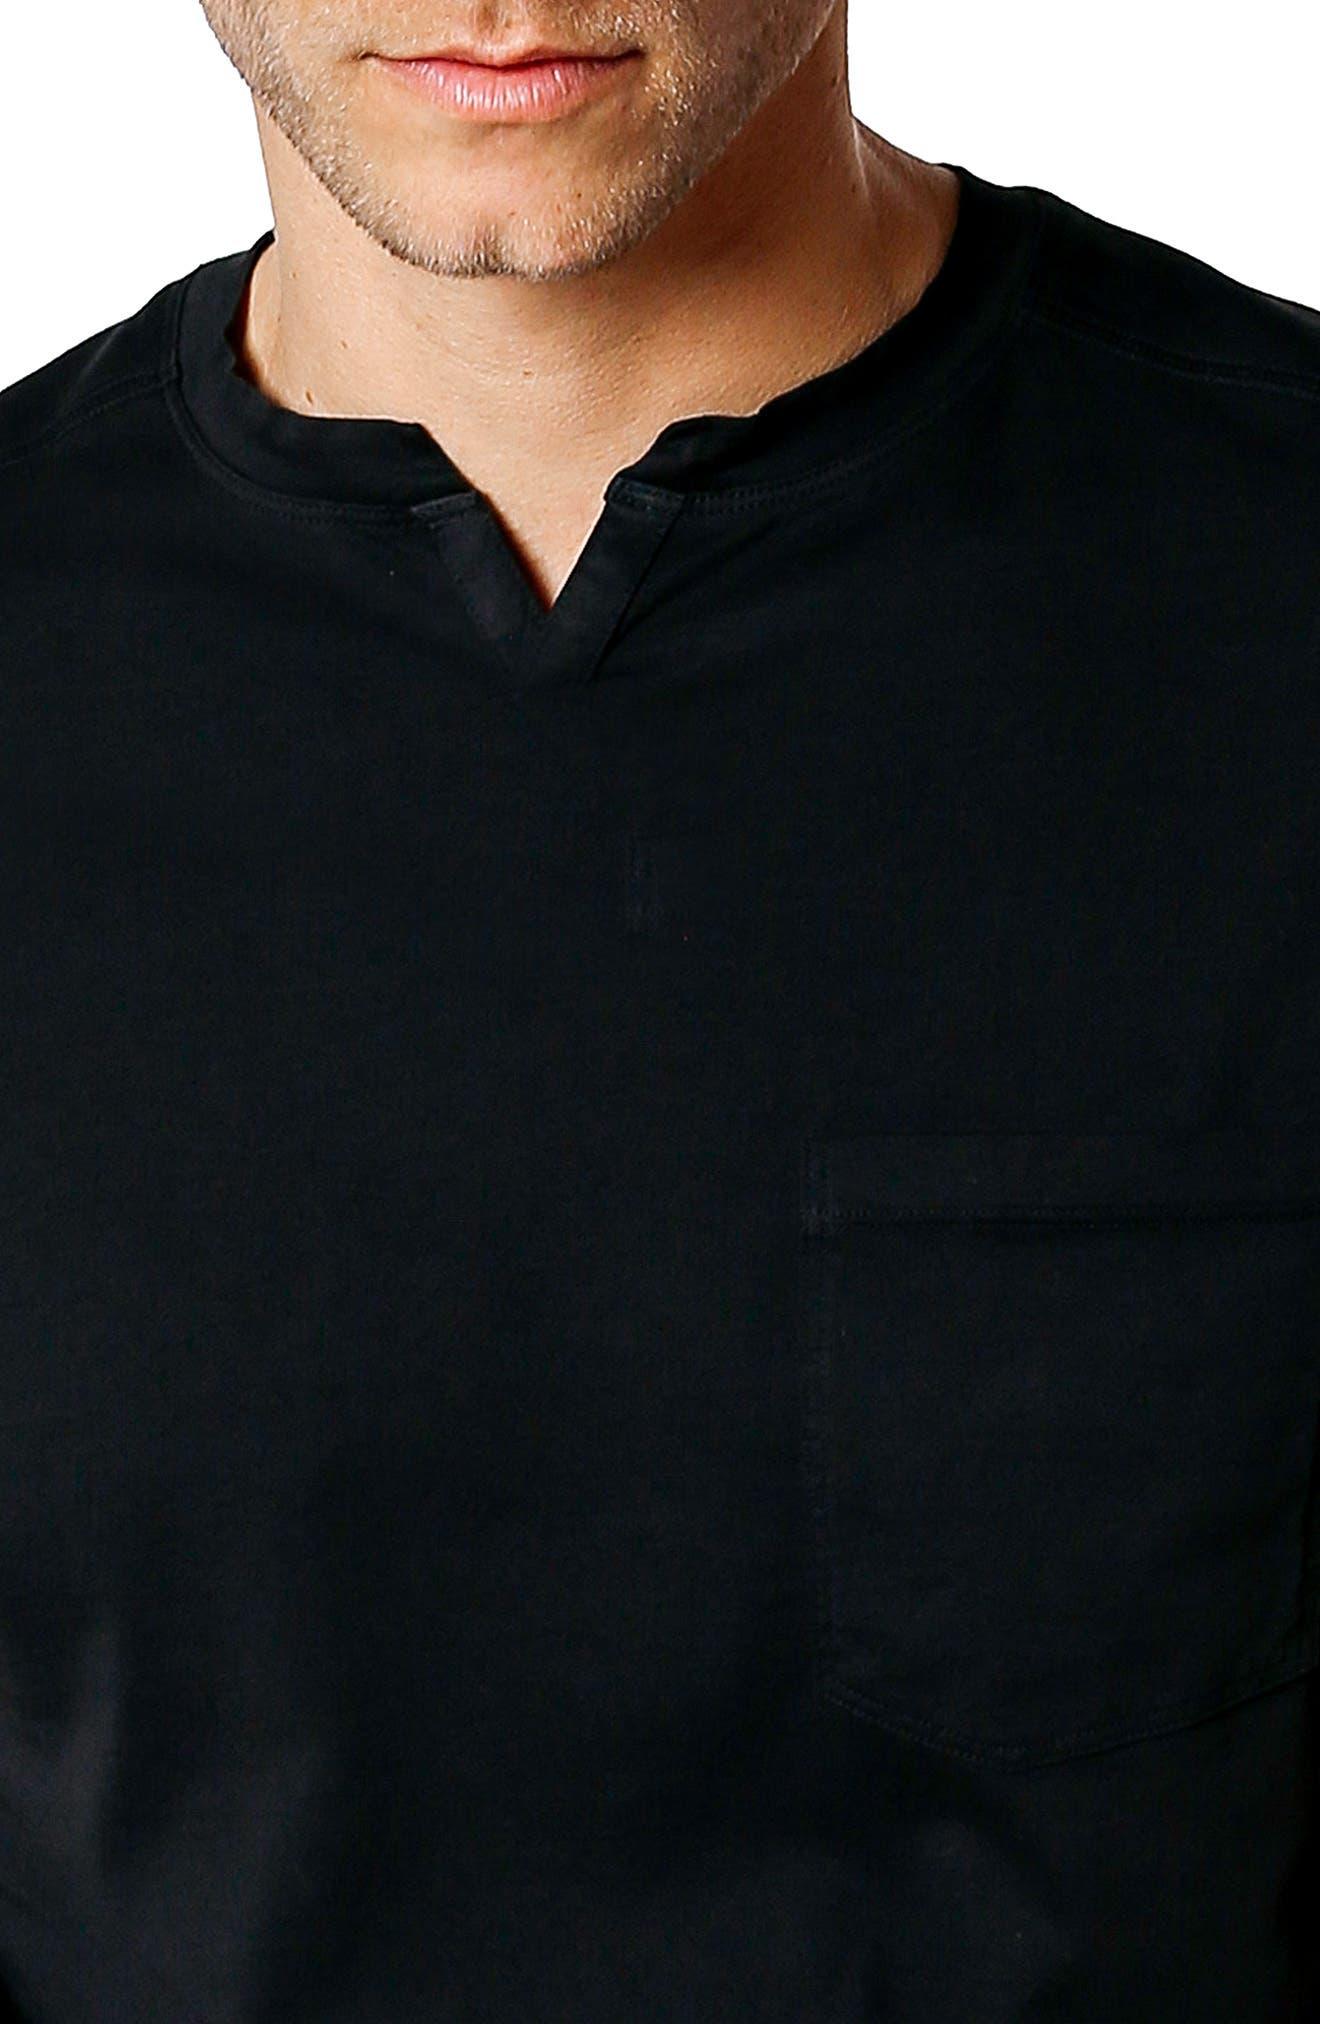 Slim Fit V-Neck T-Shirt,                             Alternate thumbnail 4, color,                             Black